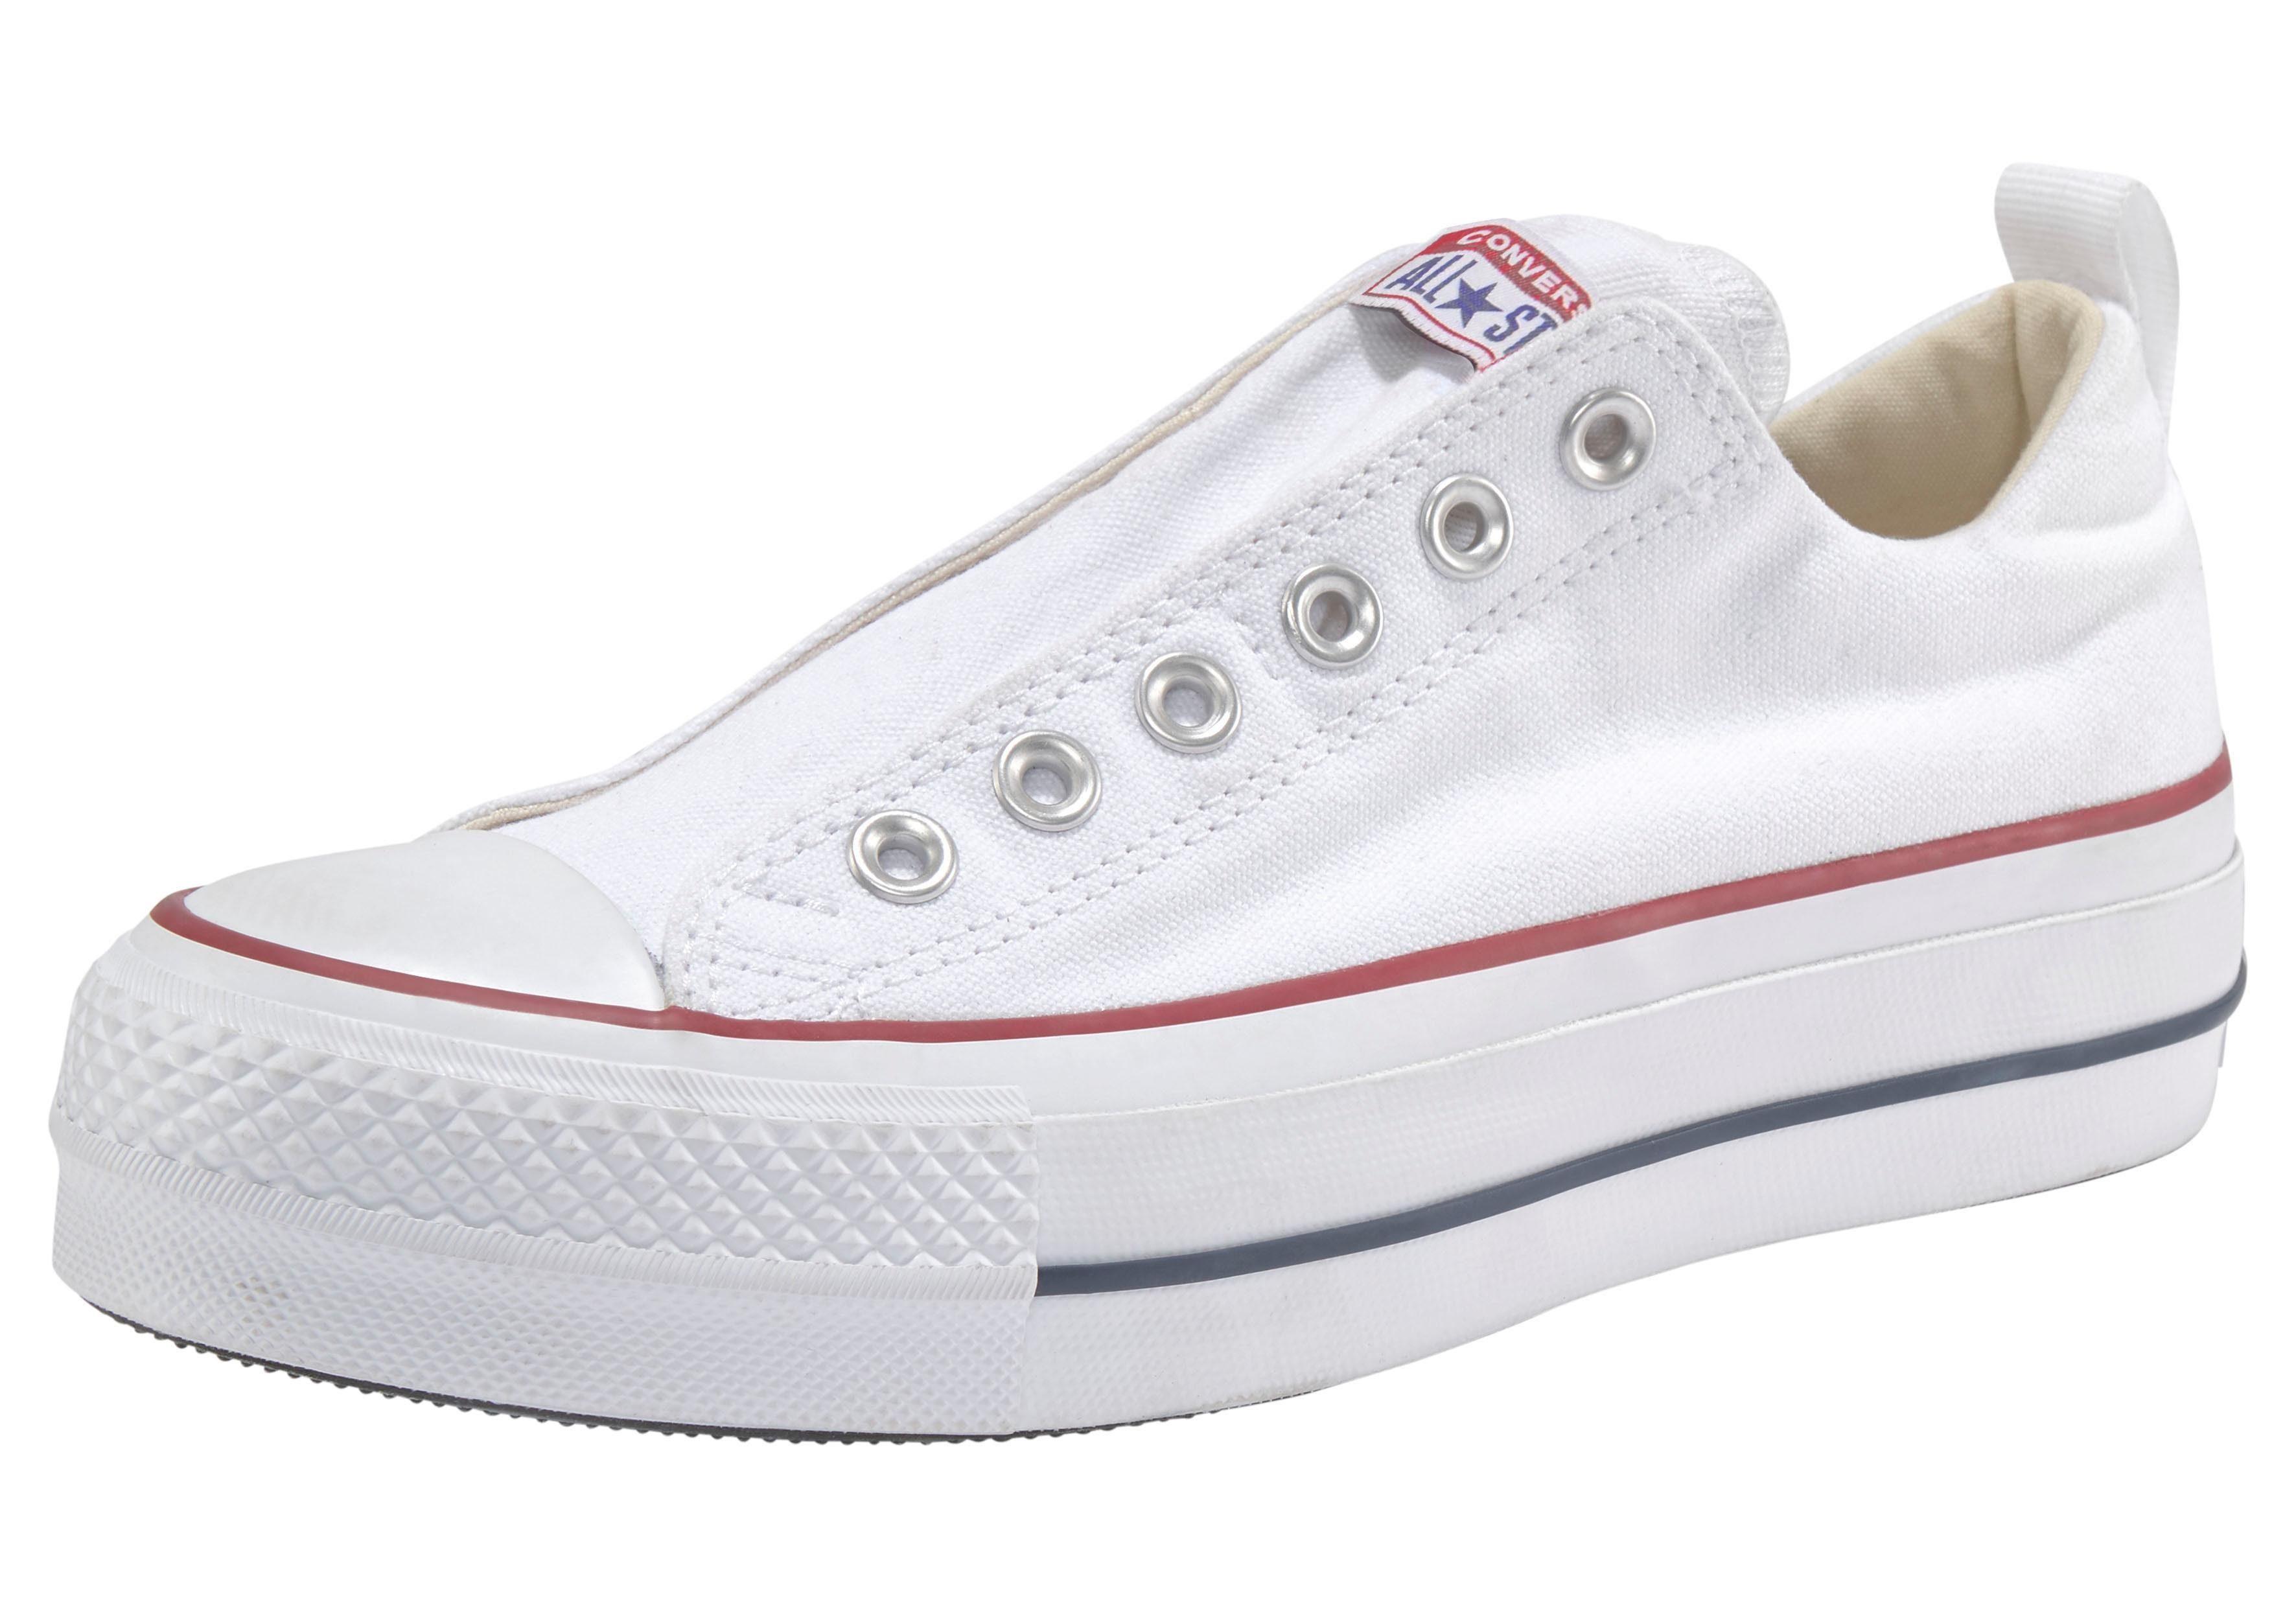 Converse »Chuck Taylor All Star Lift Slip Ox« Plateausneaker online kaufen | OTTO